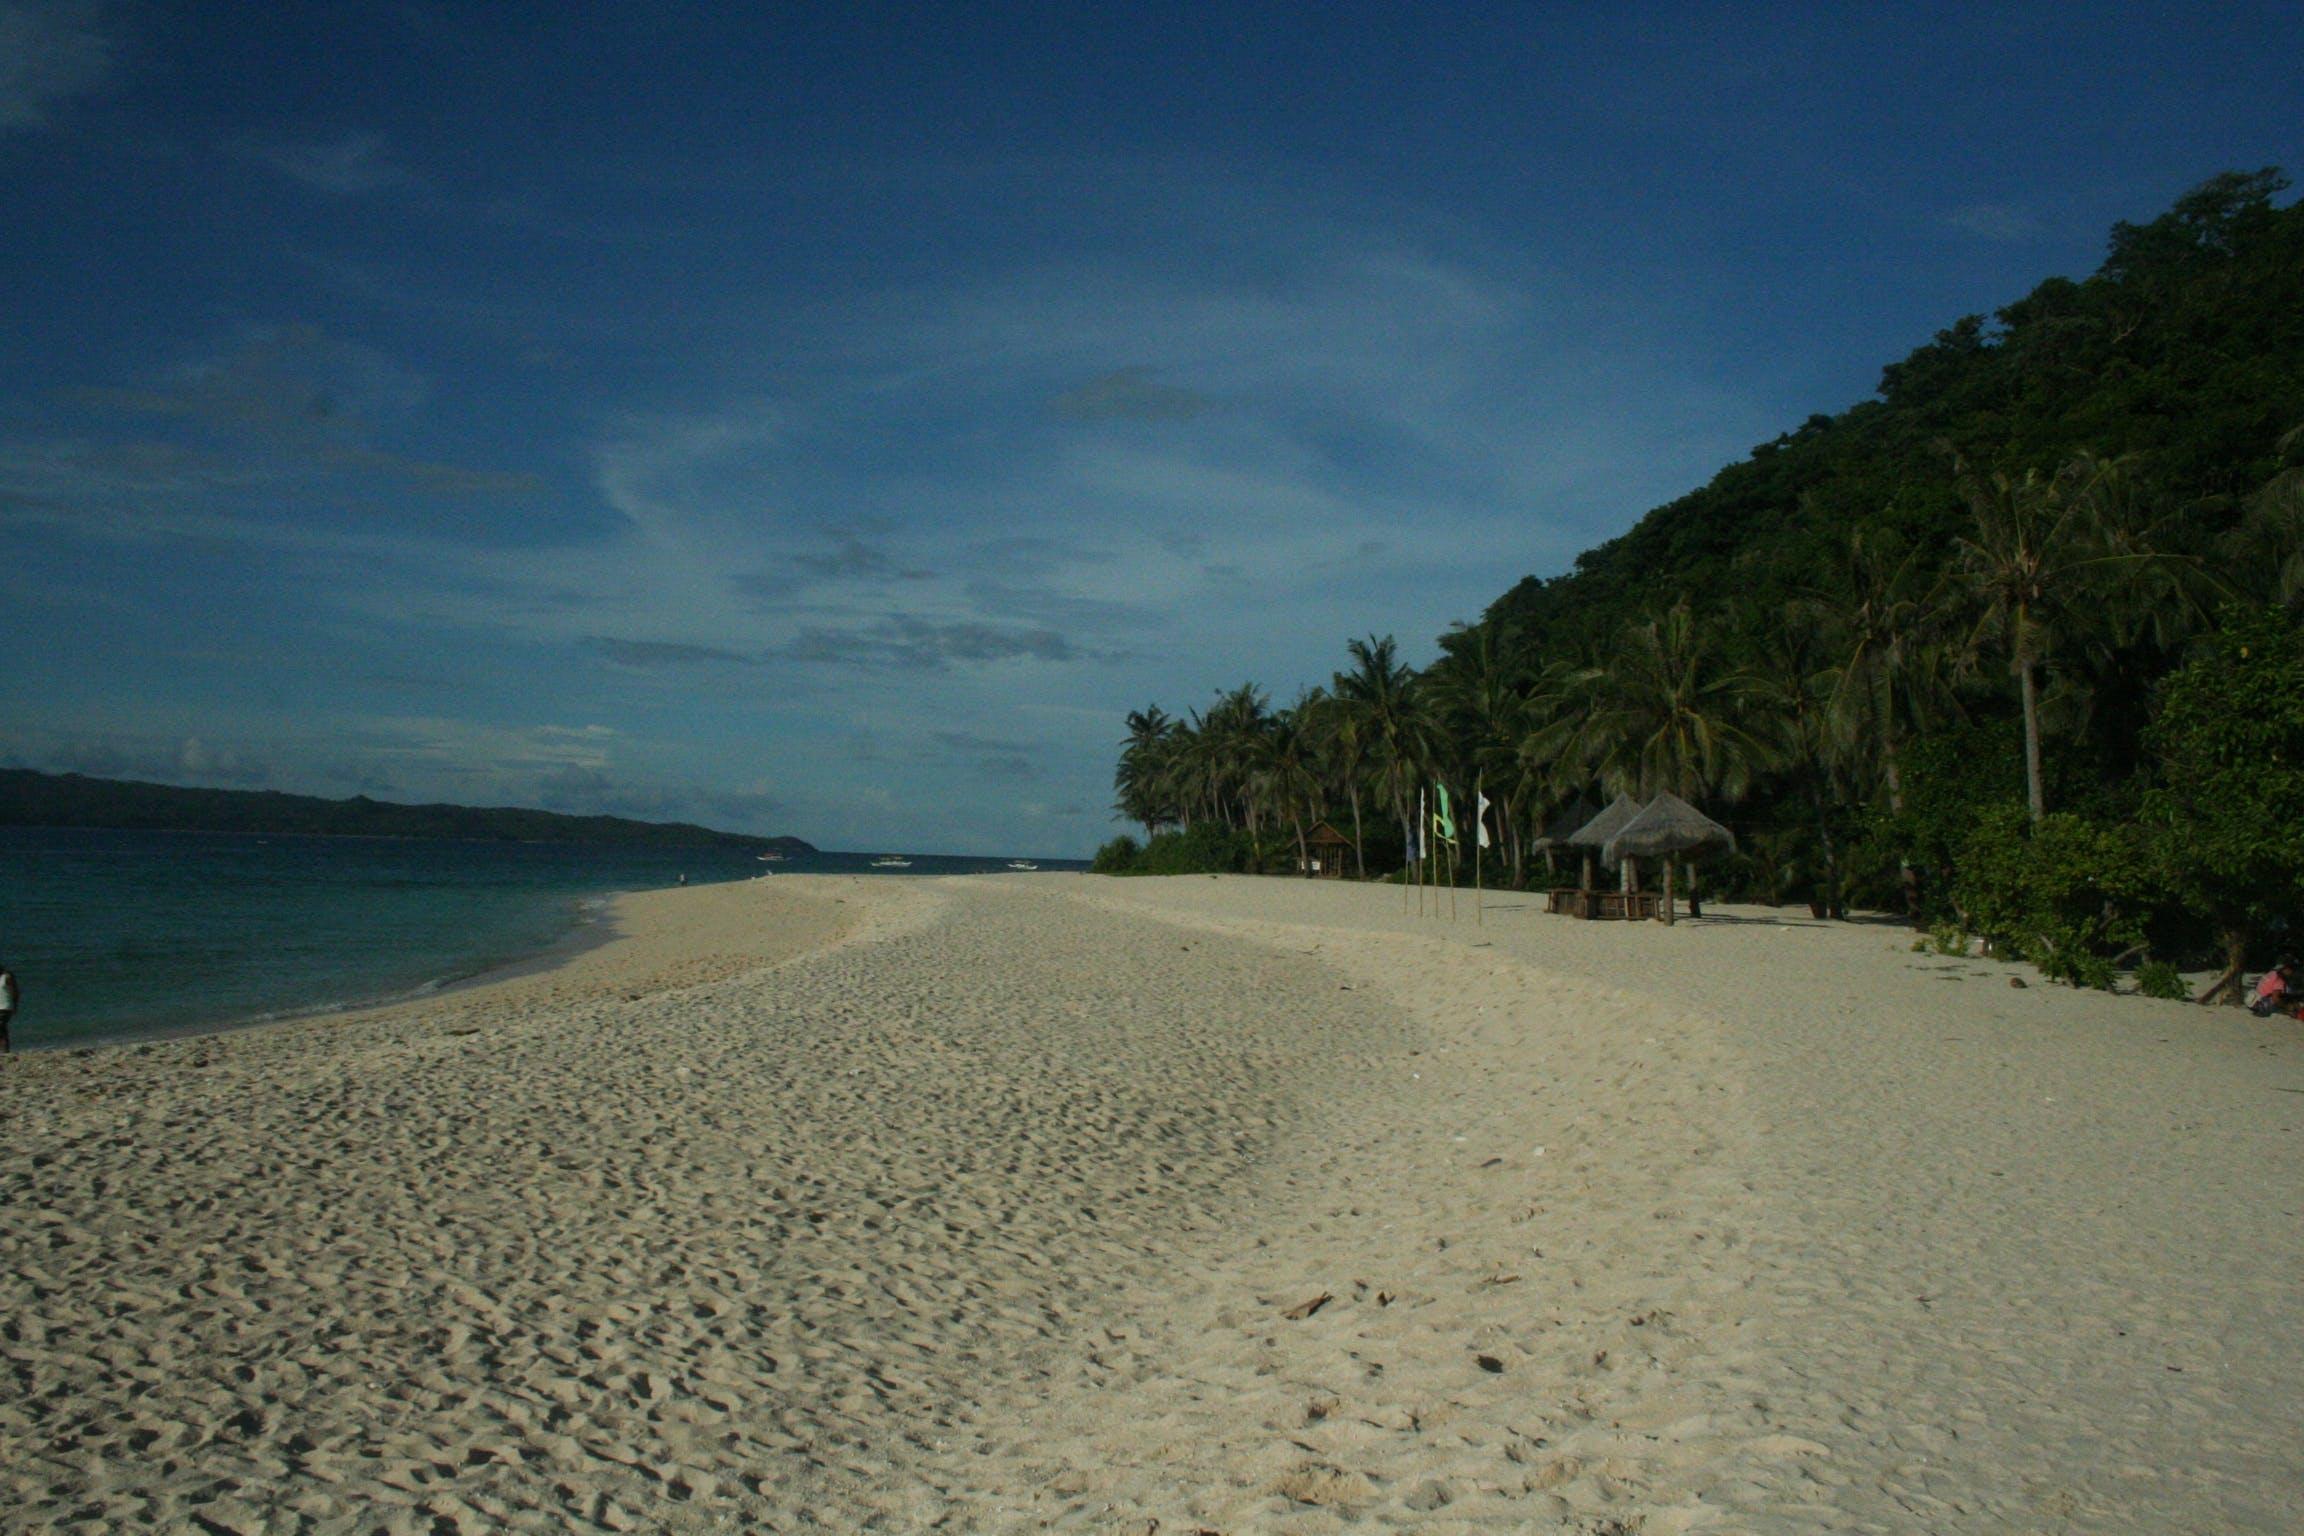 beach, blue skies, forest